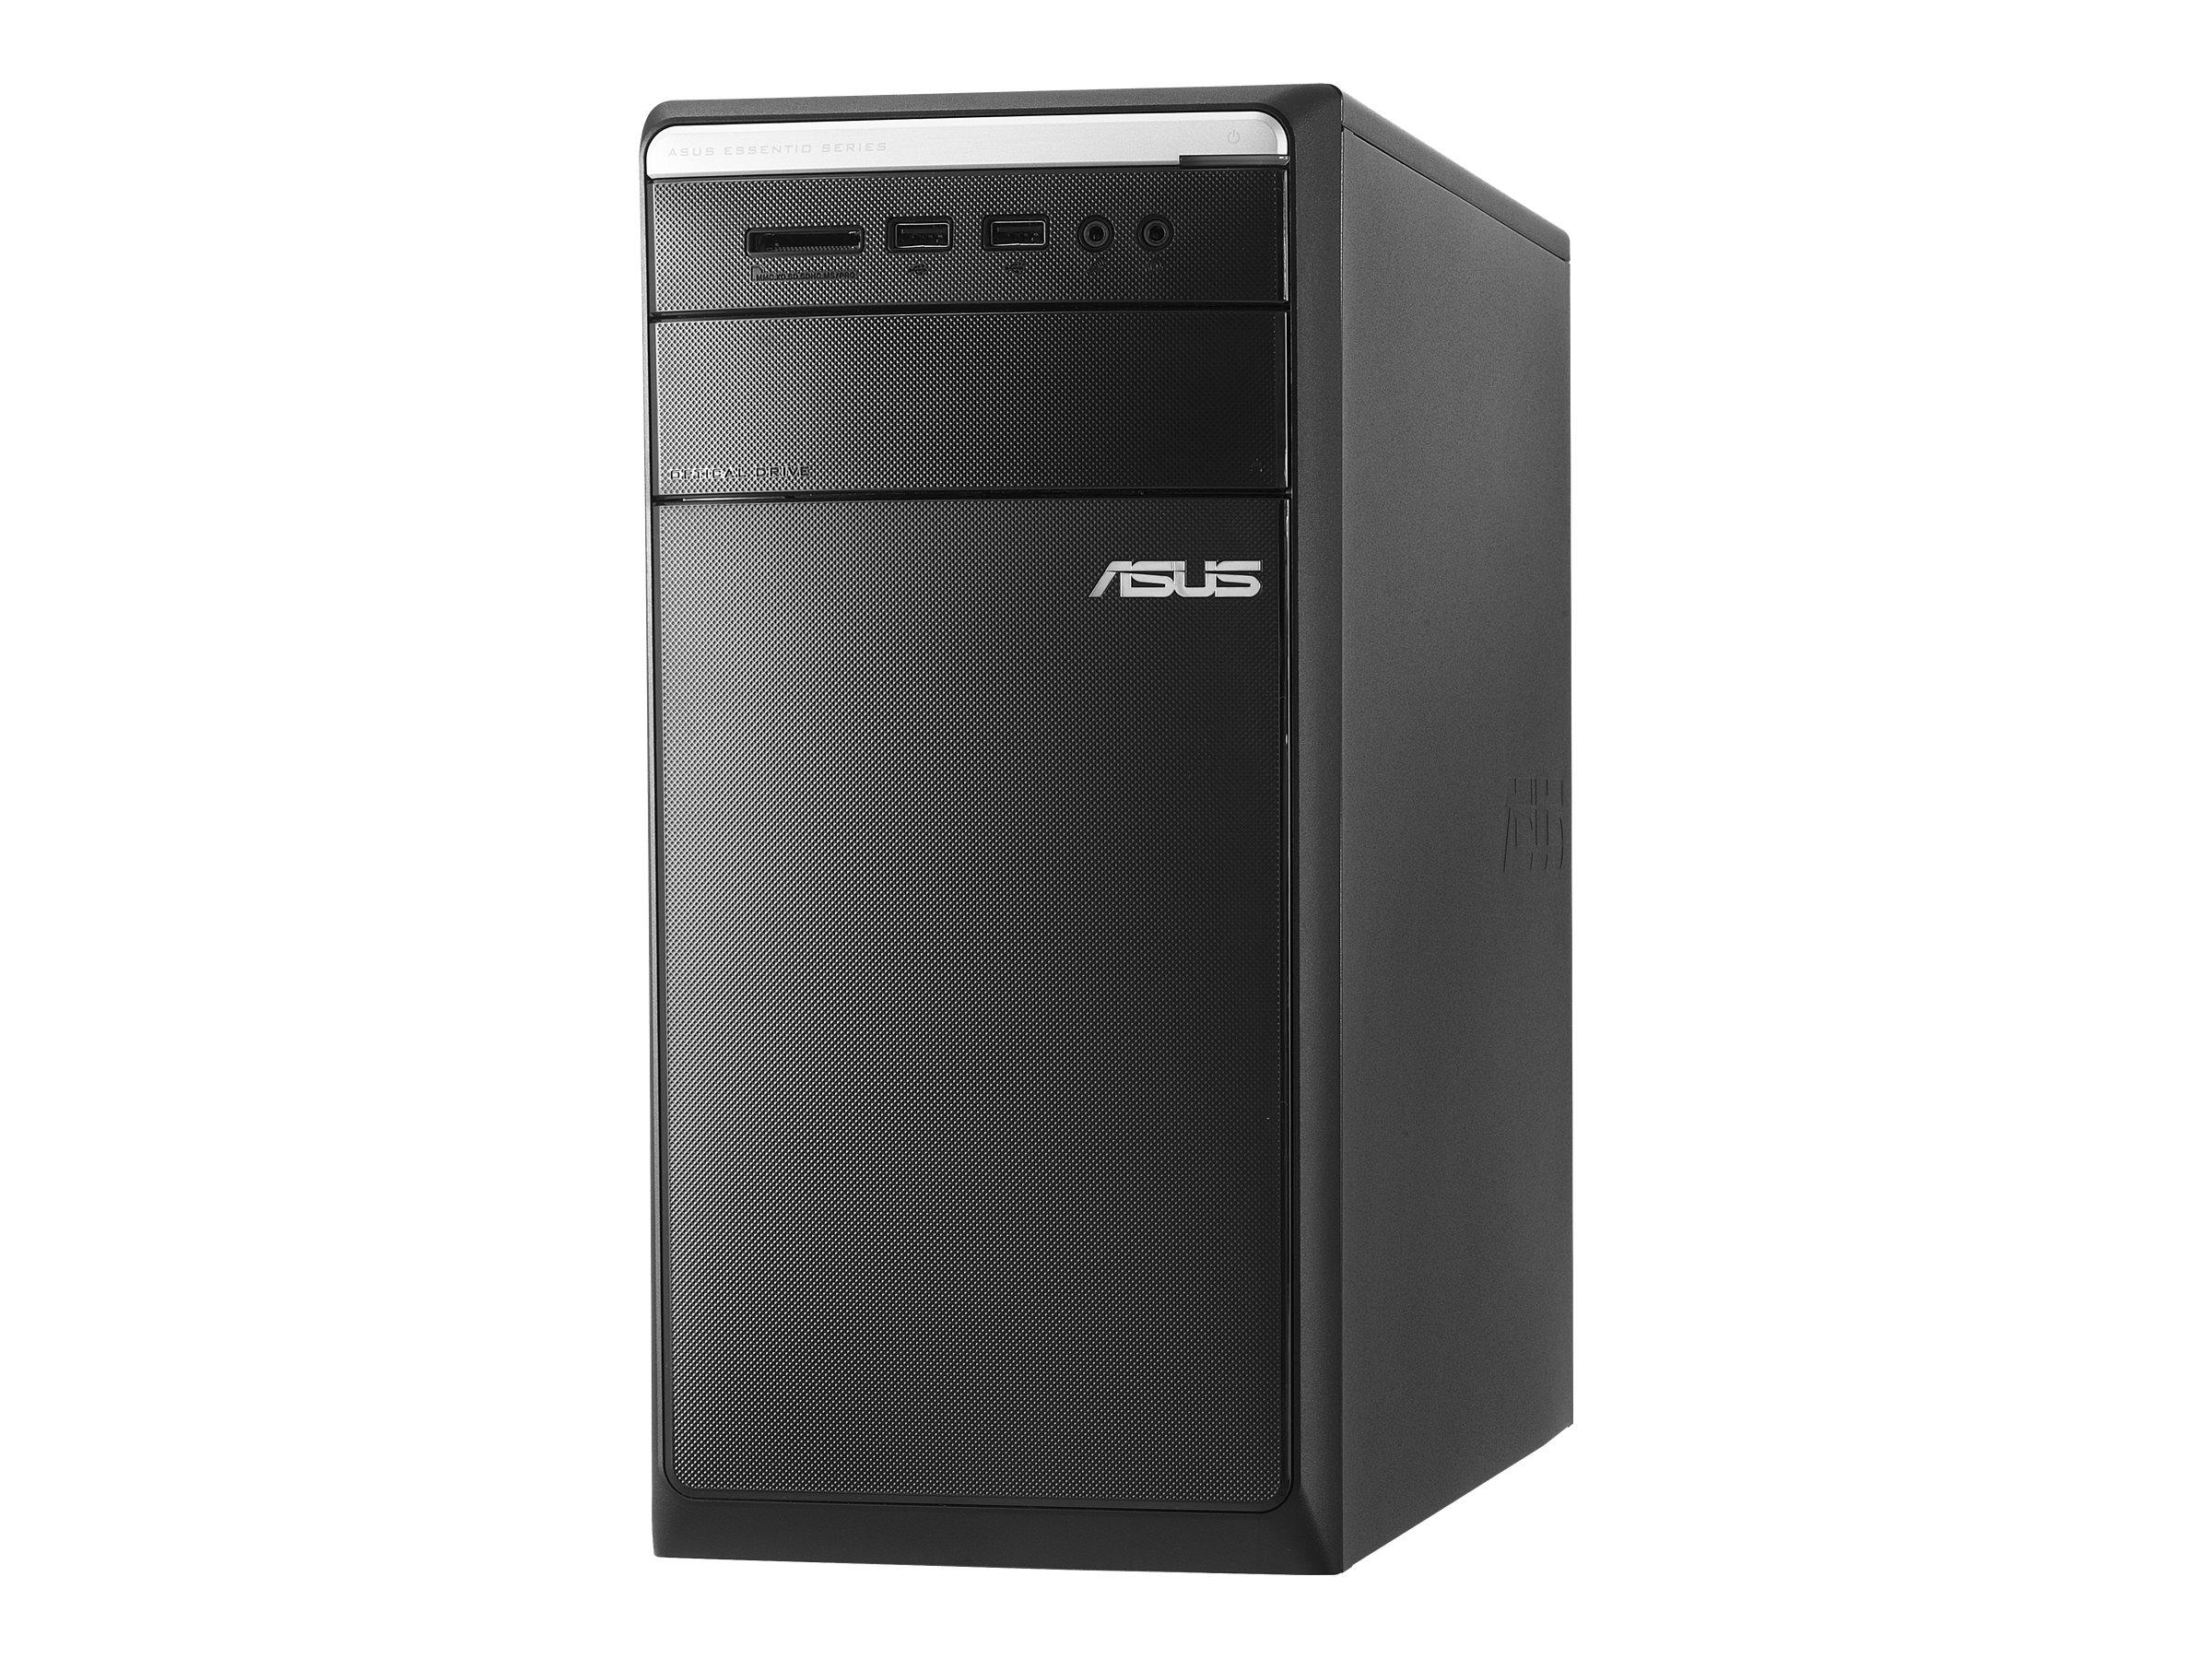 Asus Desktop PC A8-6500 W8